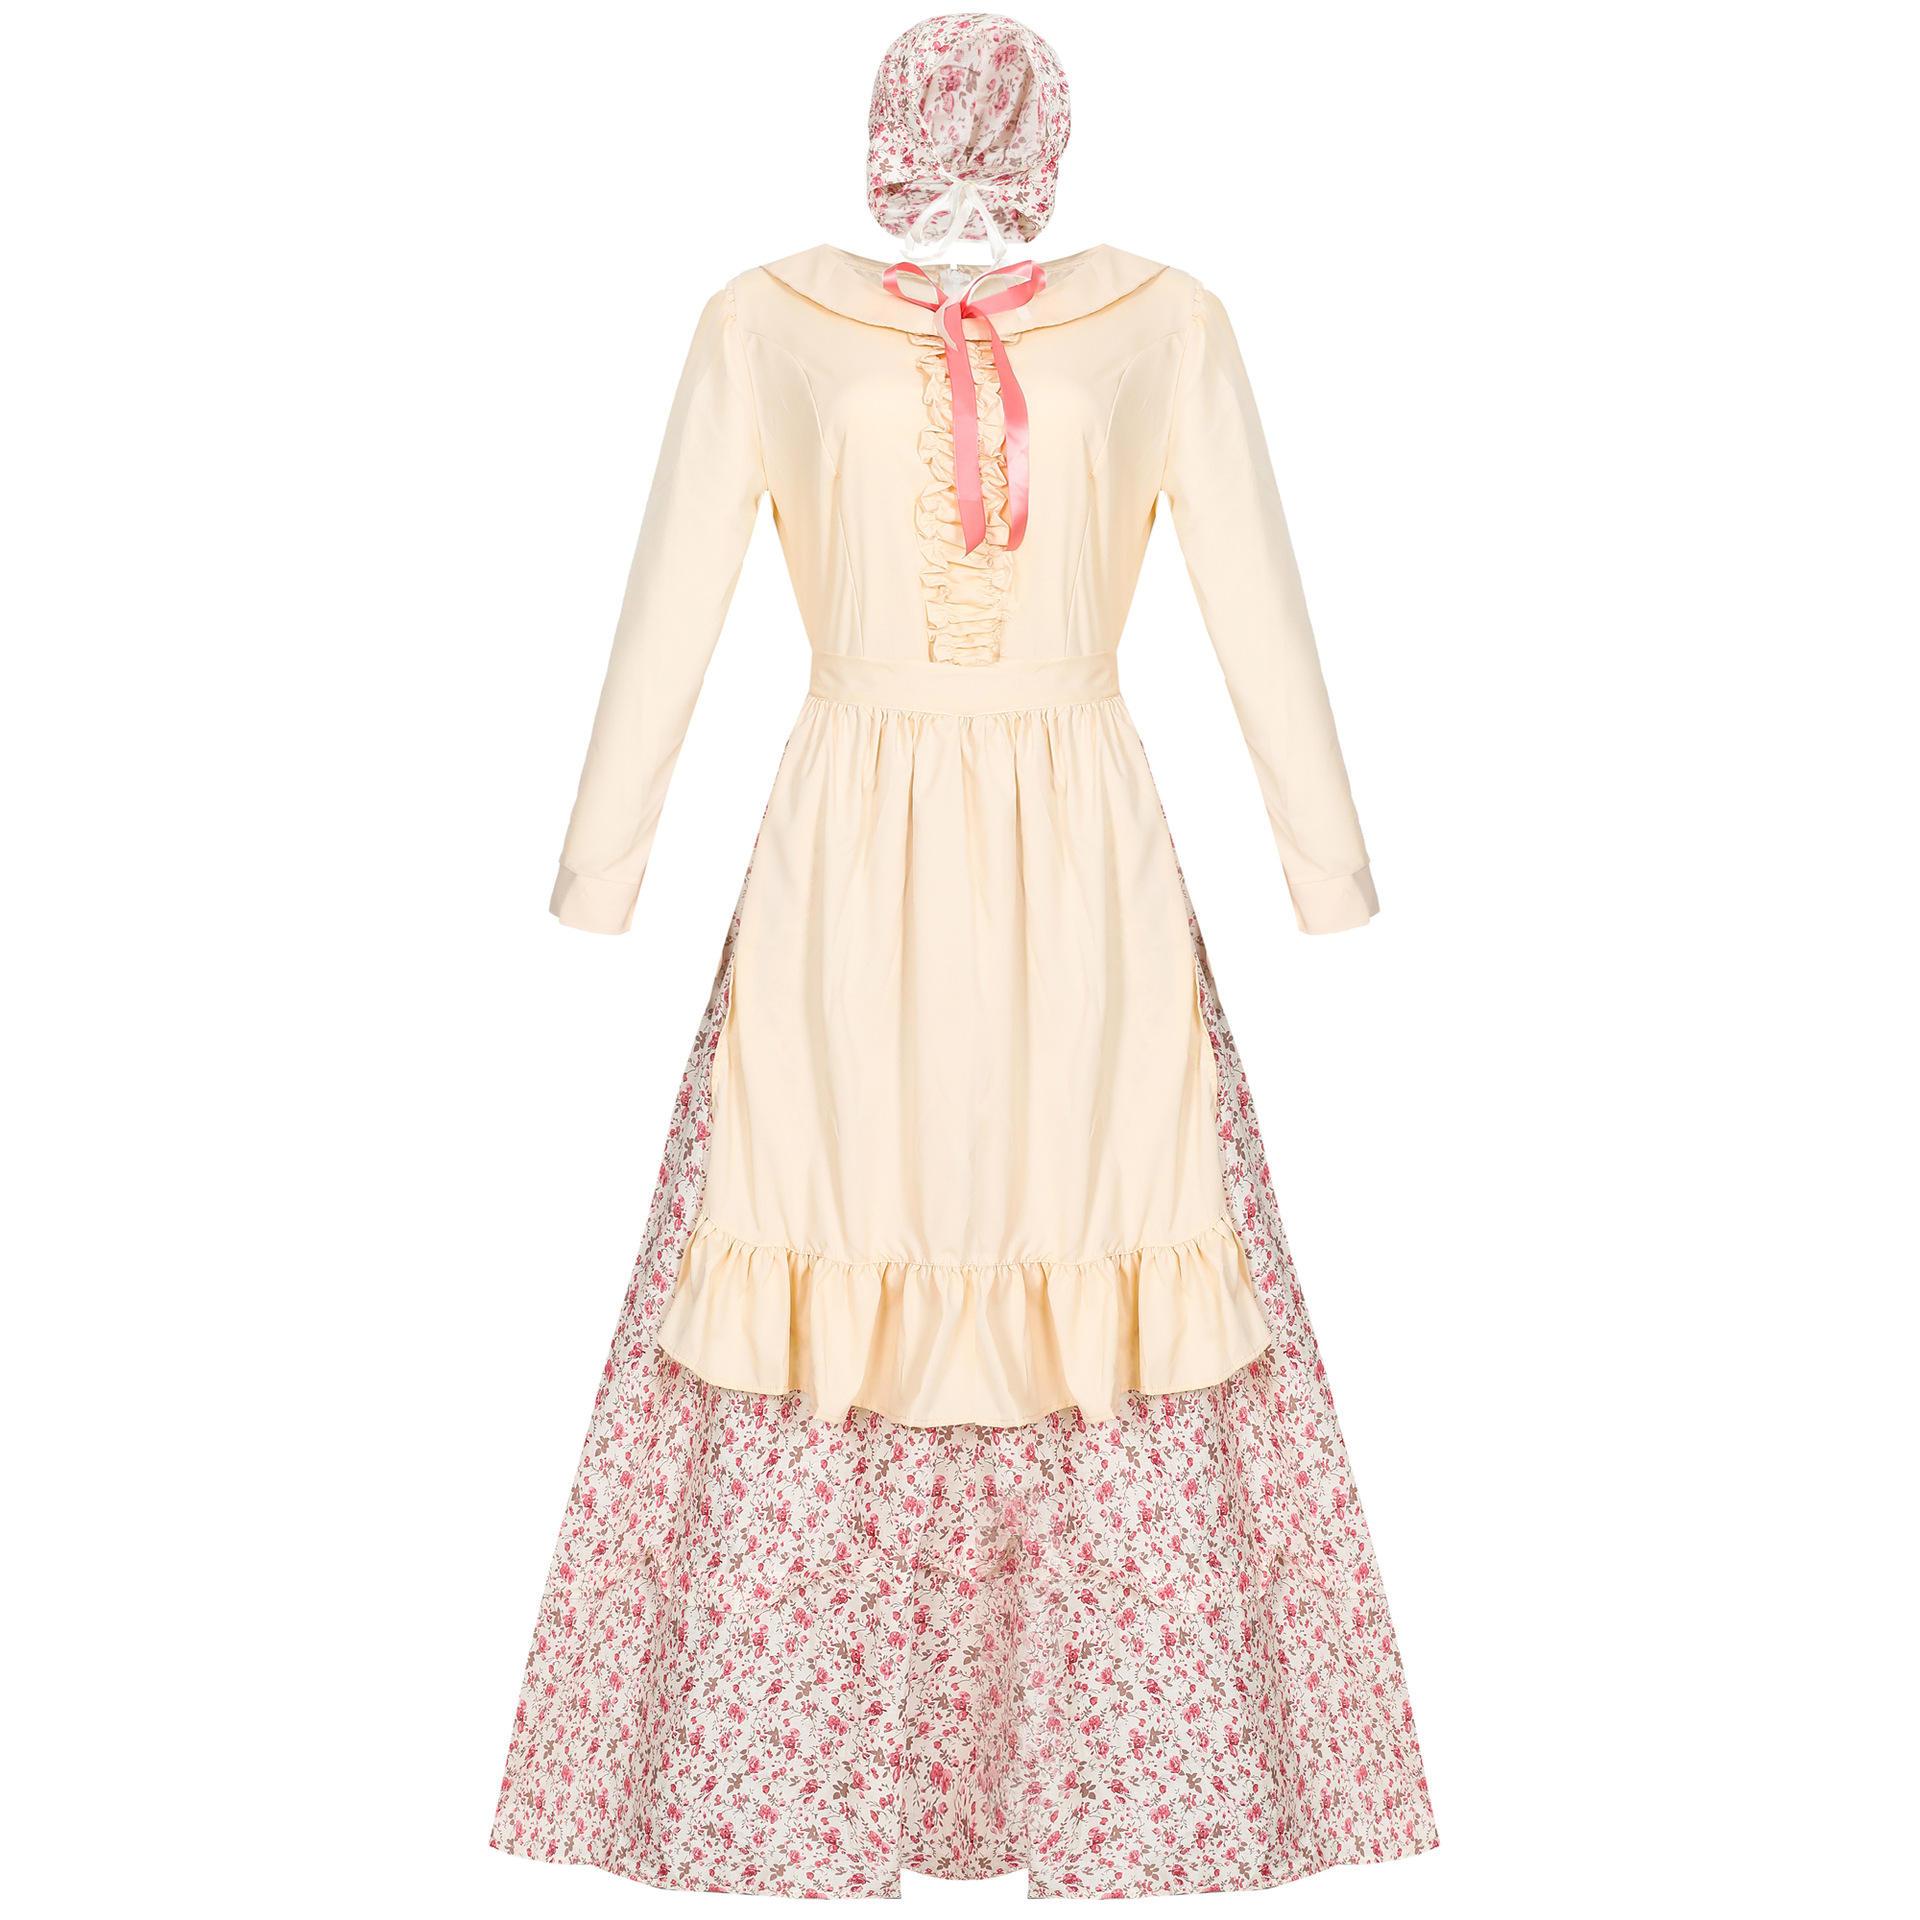 Kids Girls Halloween Victorian Colonial Dress Cosplay Costume Rural Dress Apron